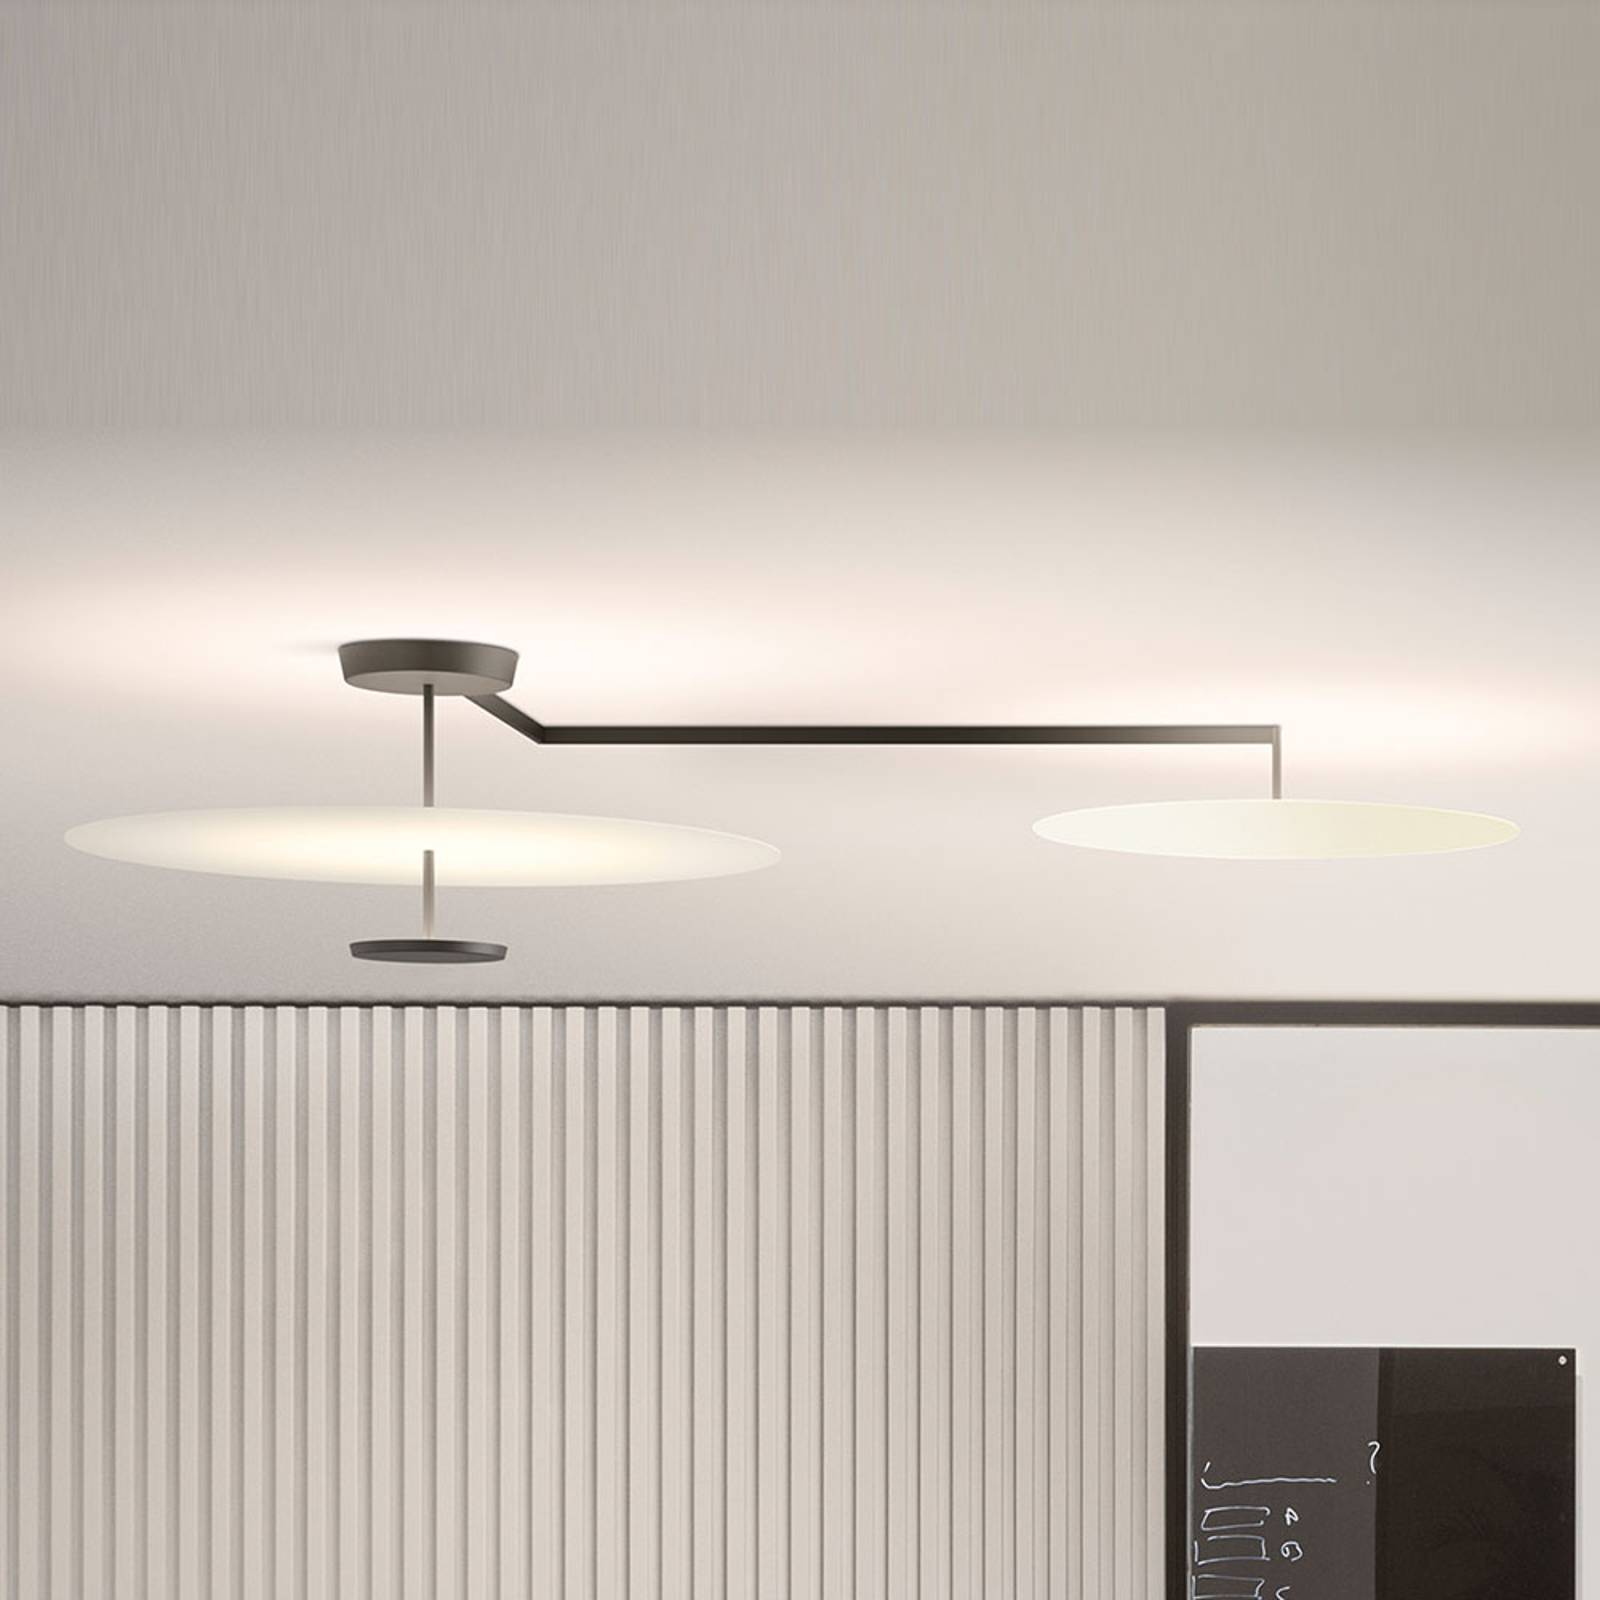 Vibia Flat LED-kattovalaisin 3-lamppuinen Ø 55 cm